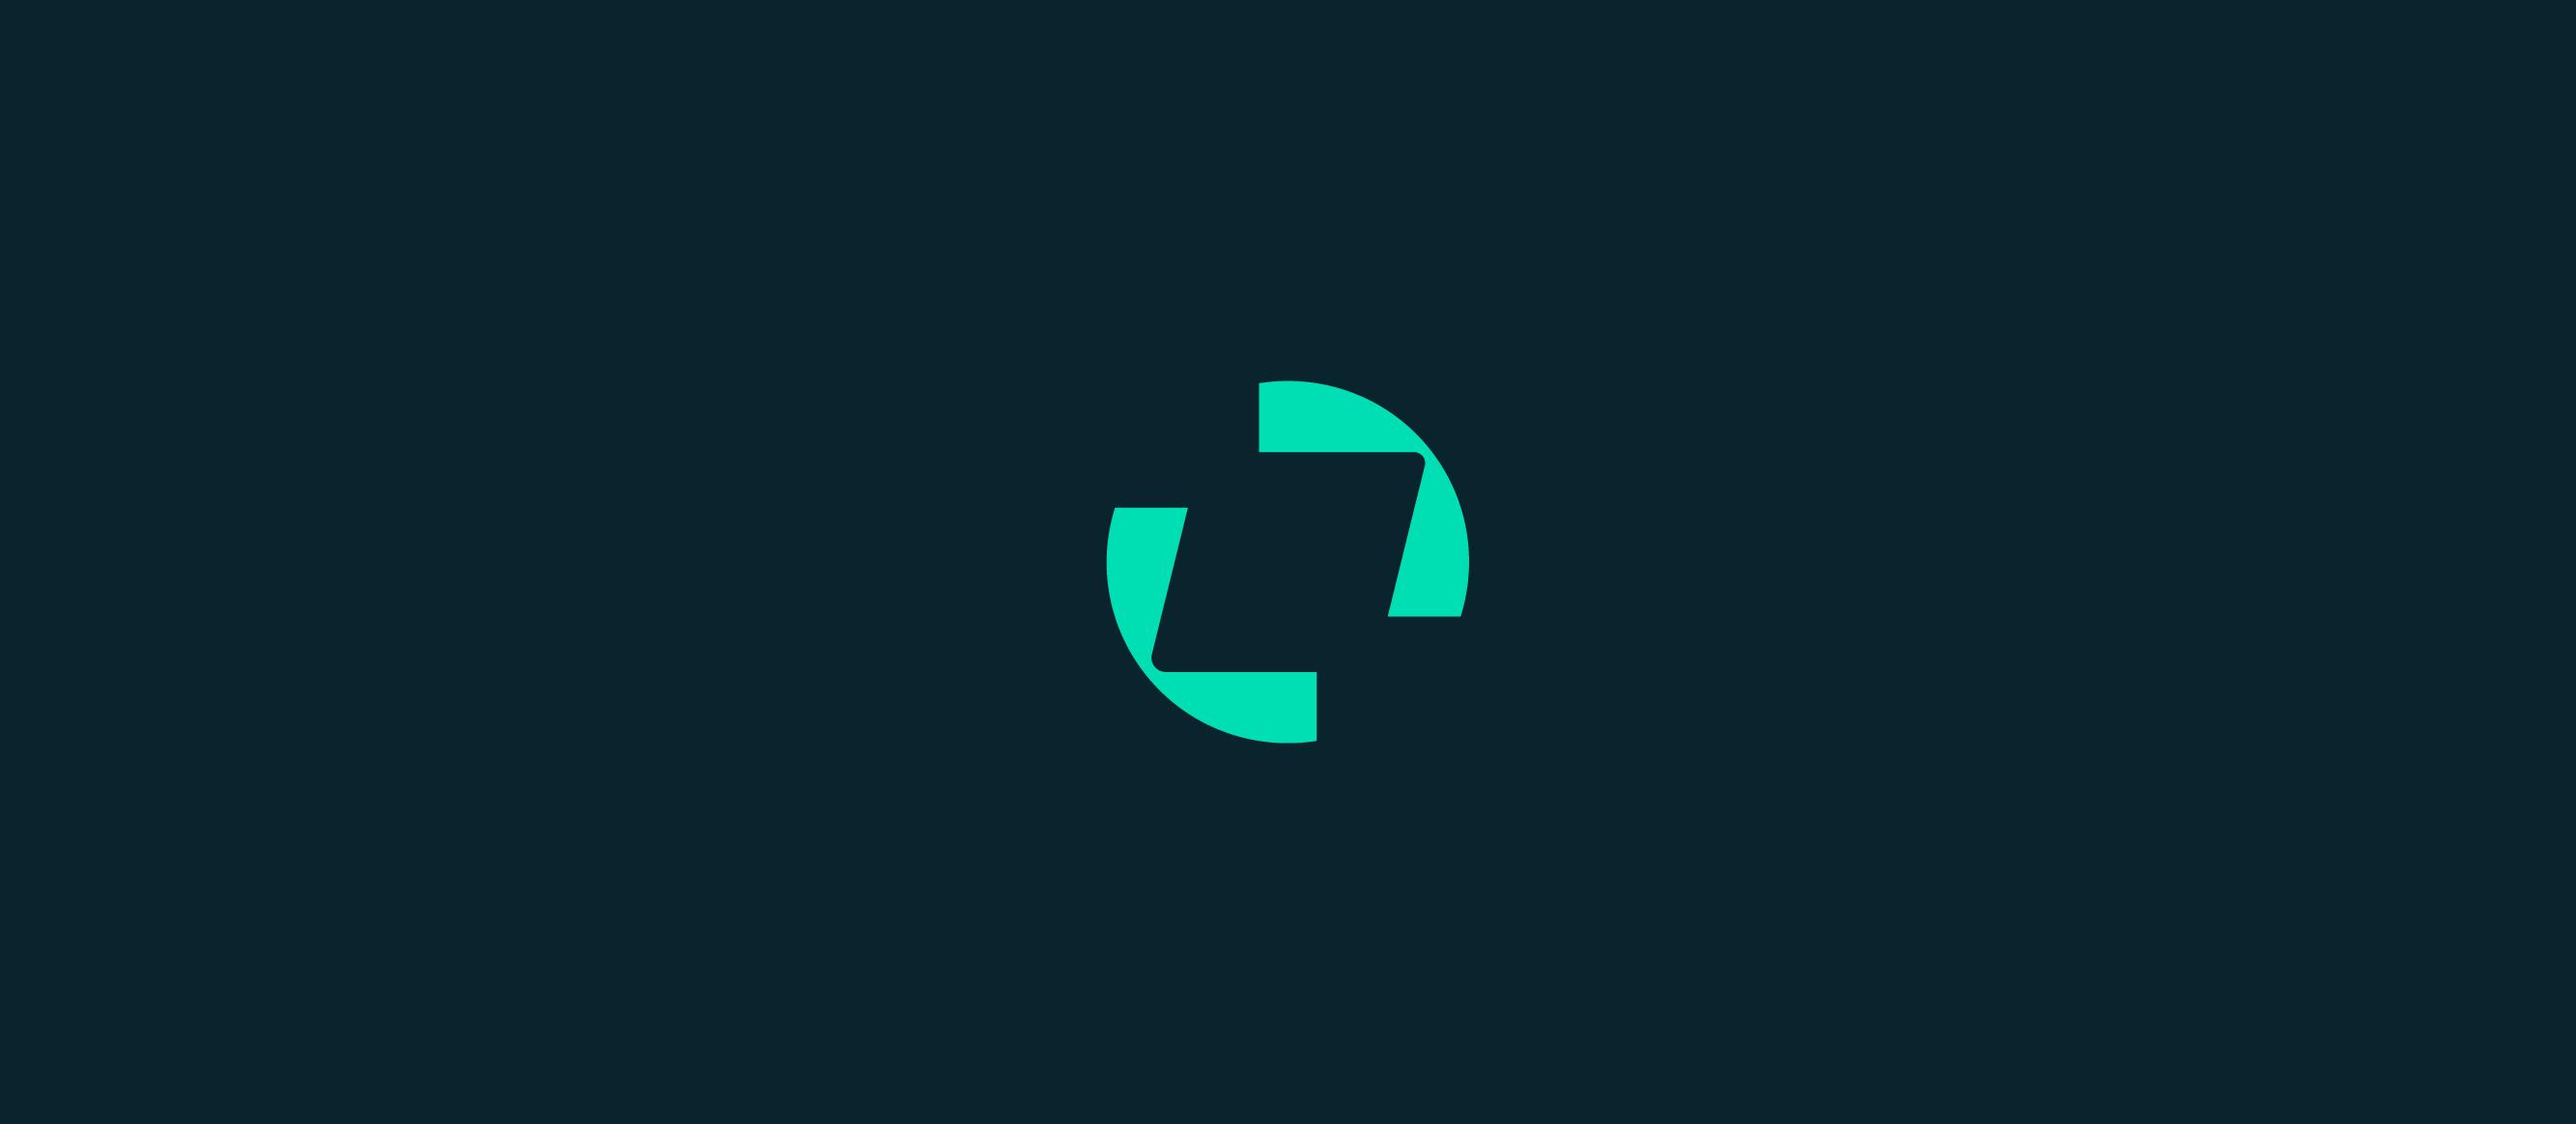 marketron-logo-identity-design-01